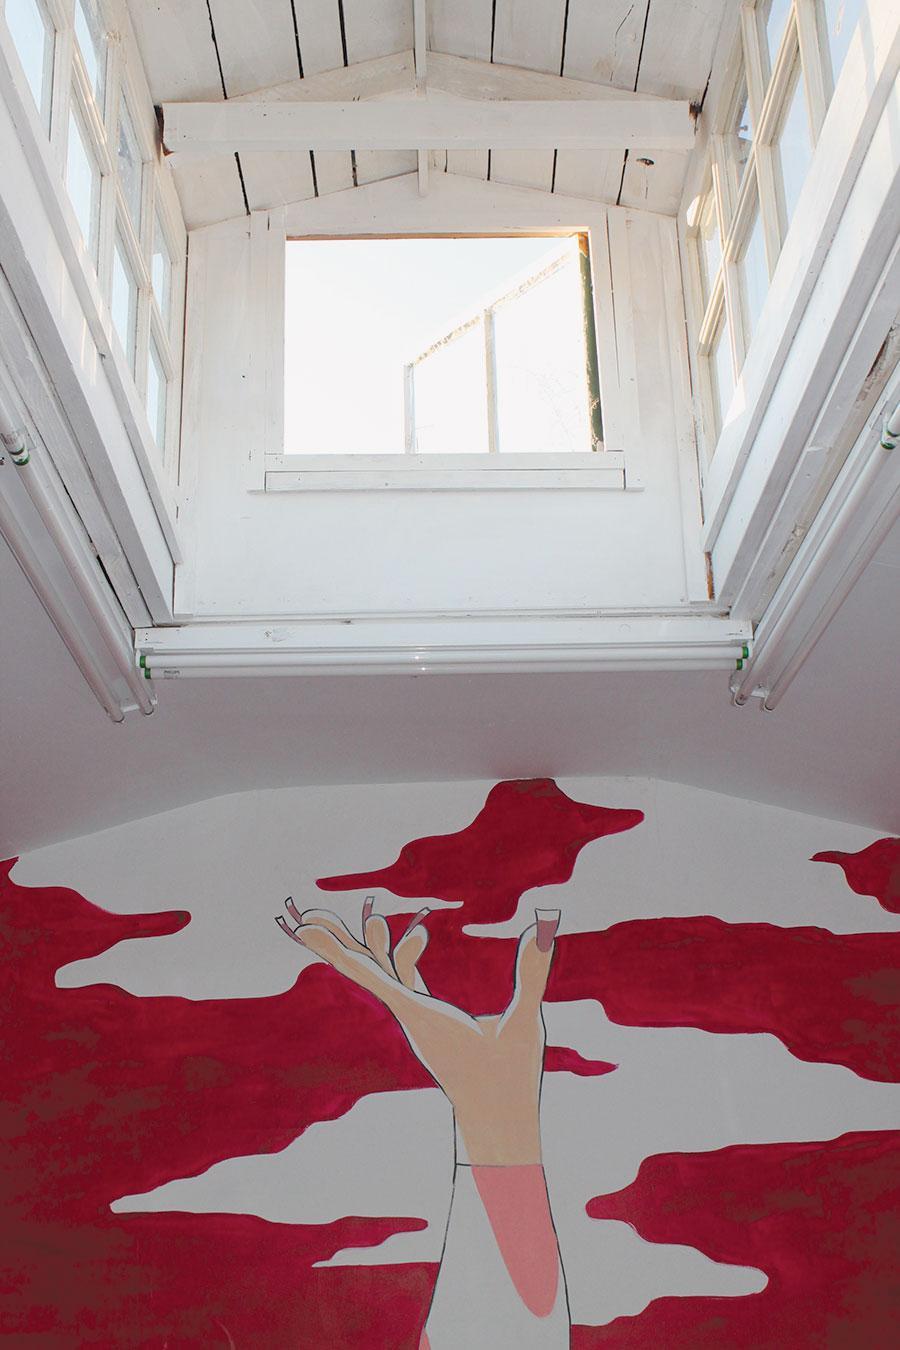 Julien Ceccaldi, 2013, exhibition view, Paradise Garage, Los Angeles. Courtesy: the artist and Paradise Garage, Los Angeles